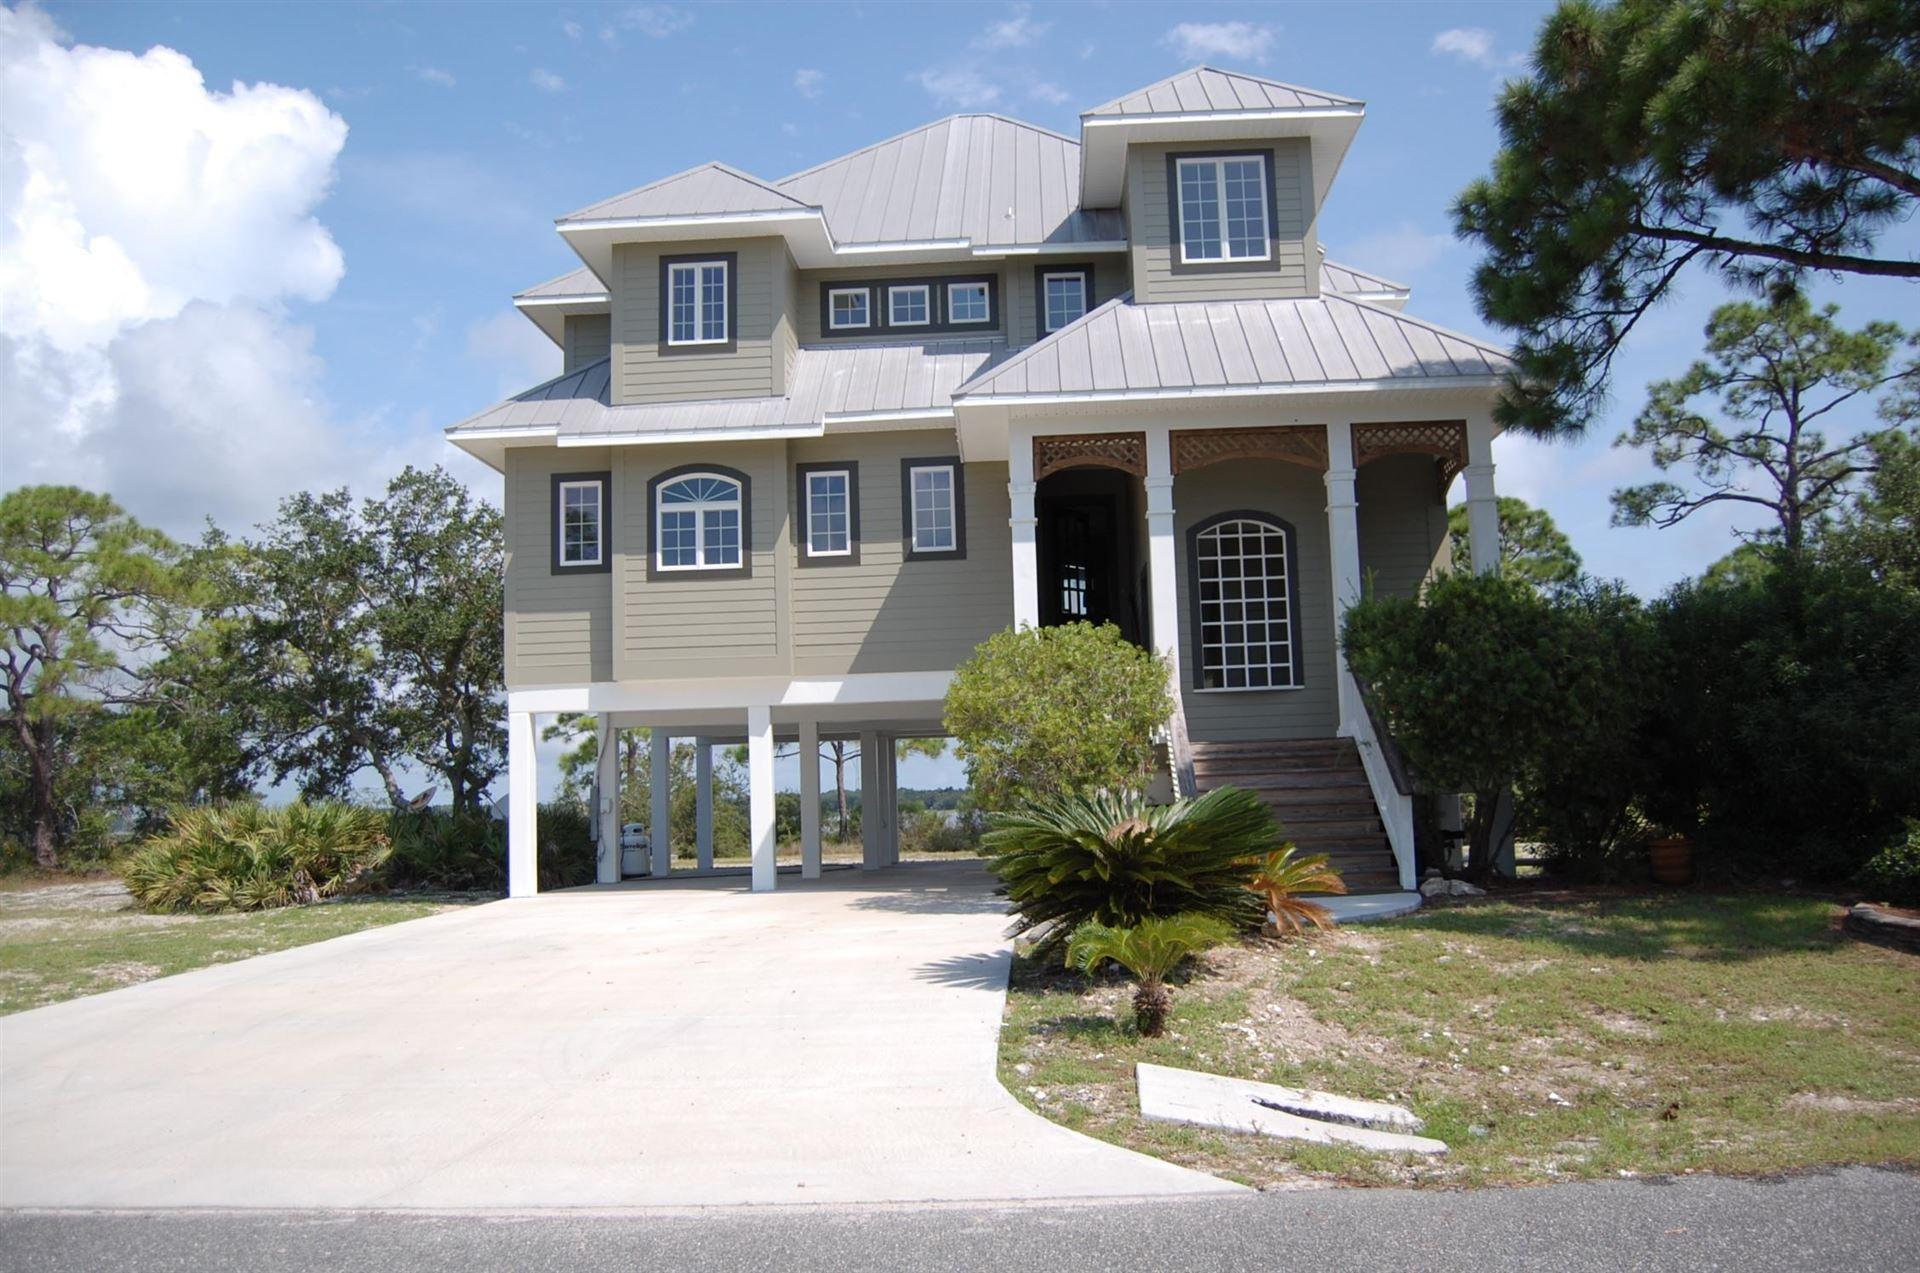 241 Hidden Harbor Drive, Alligator Point, FL 32346 - MLS#: 335757